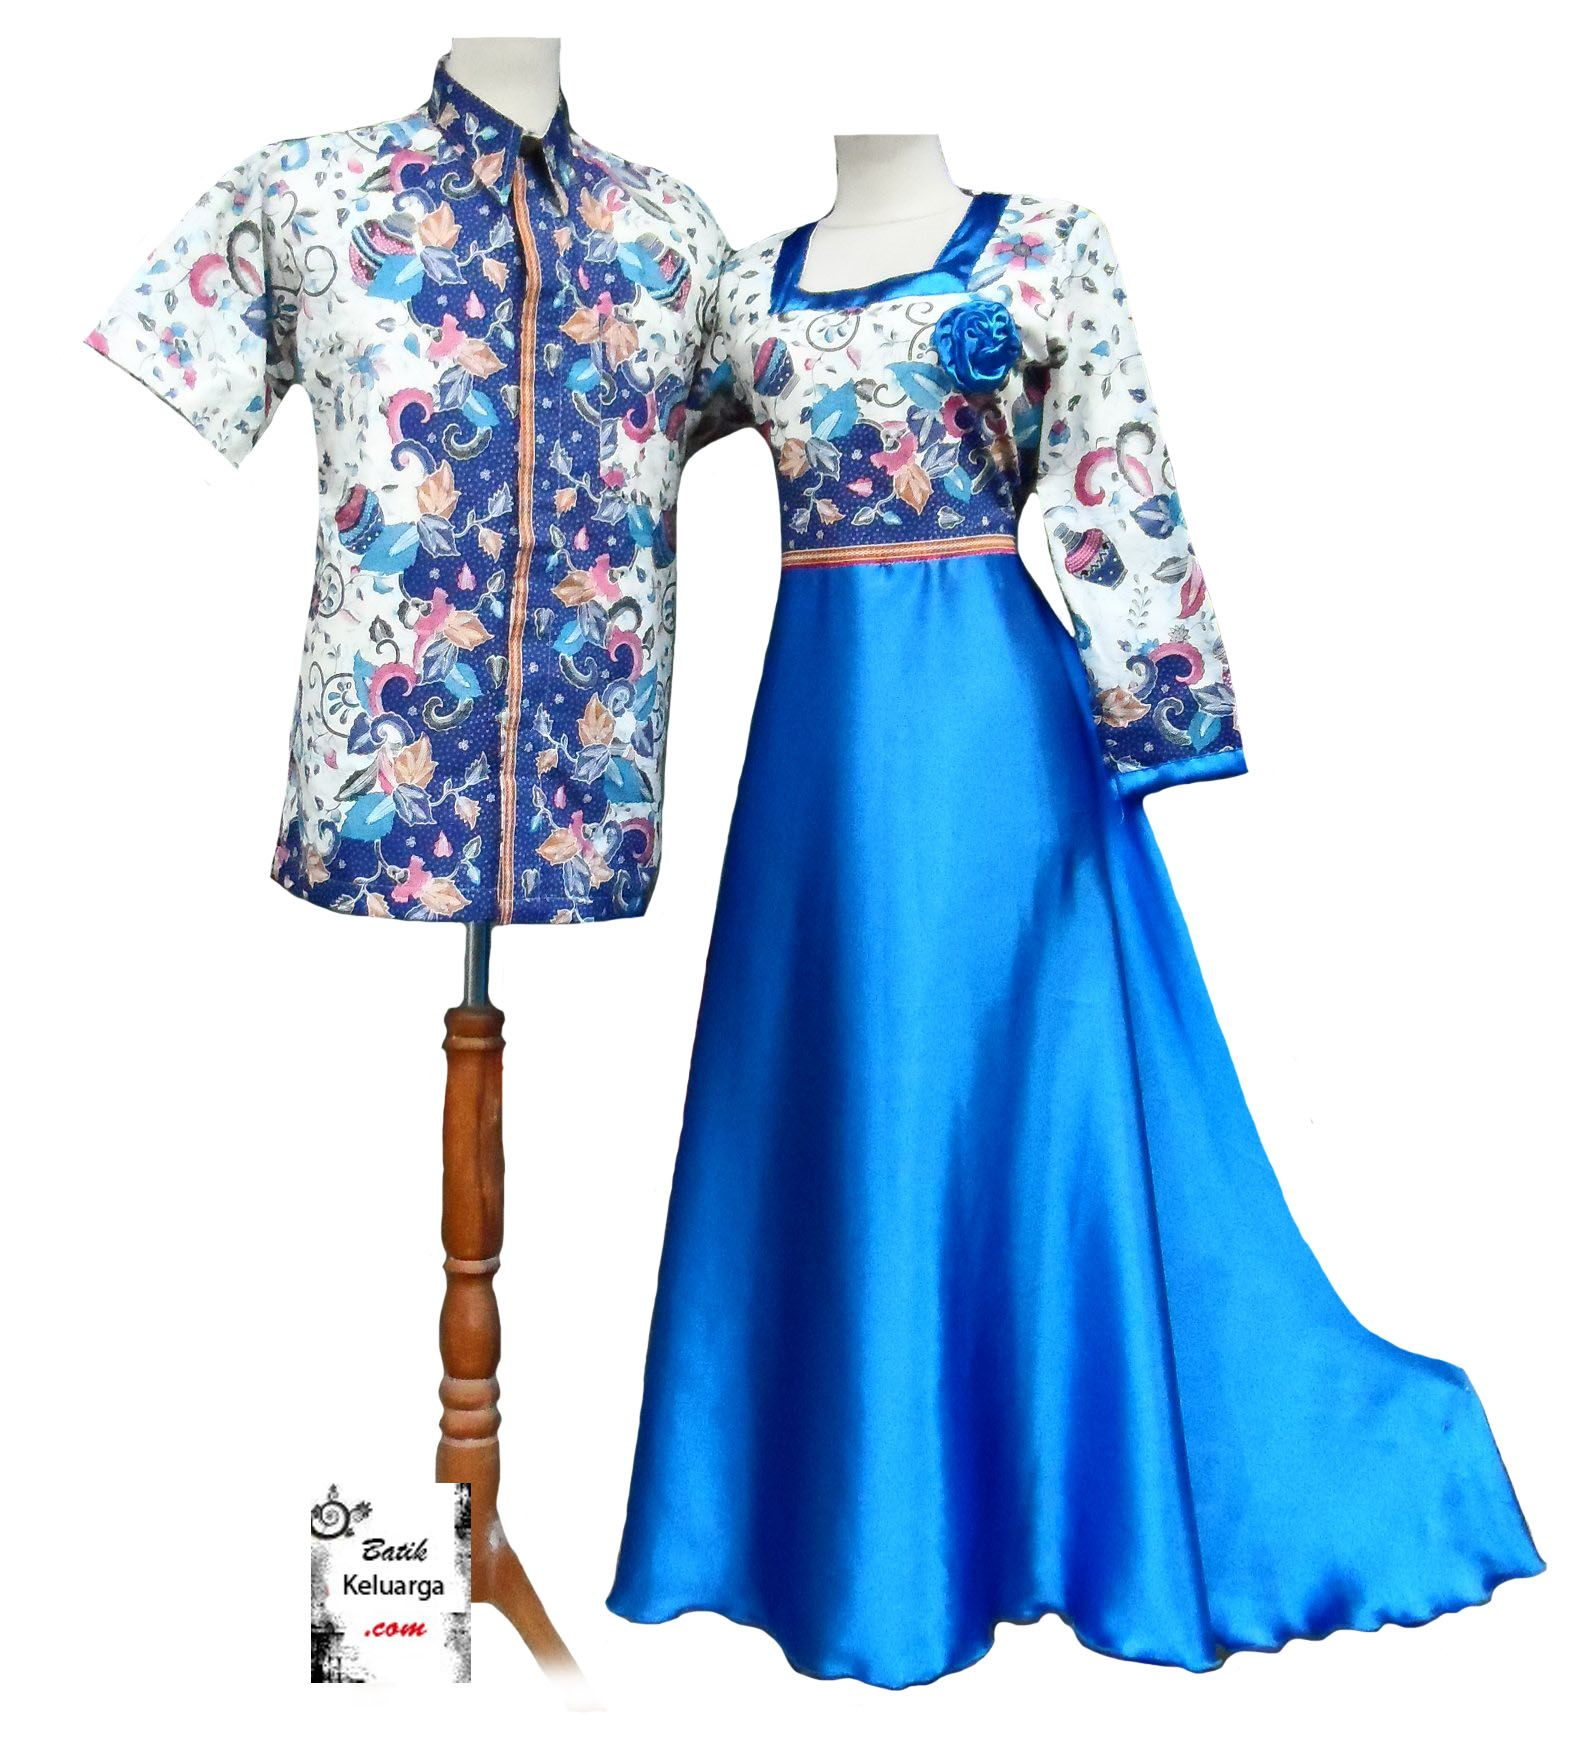 Baju Muslim Biru Bk0256 Batik Keluarga Batik Modern